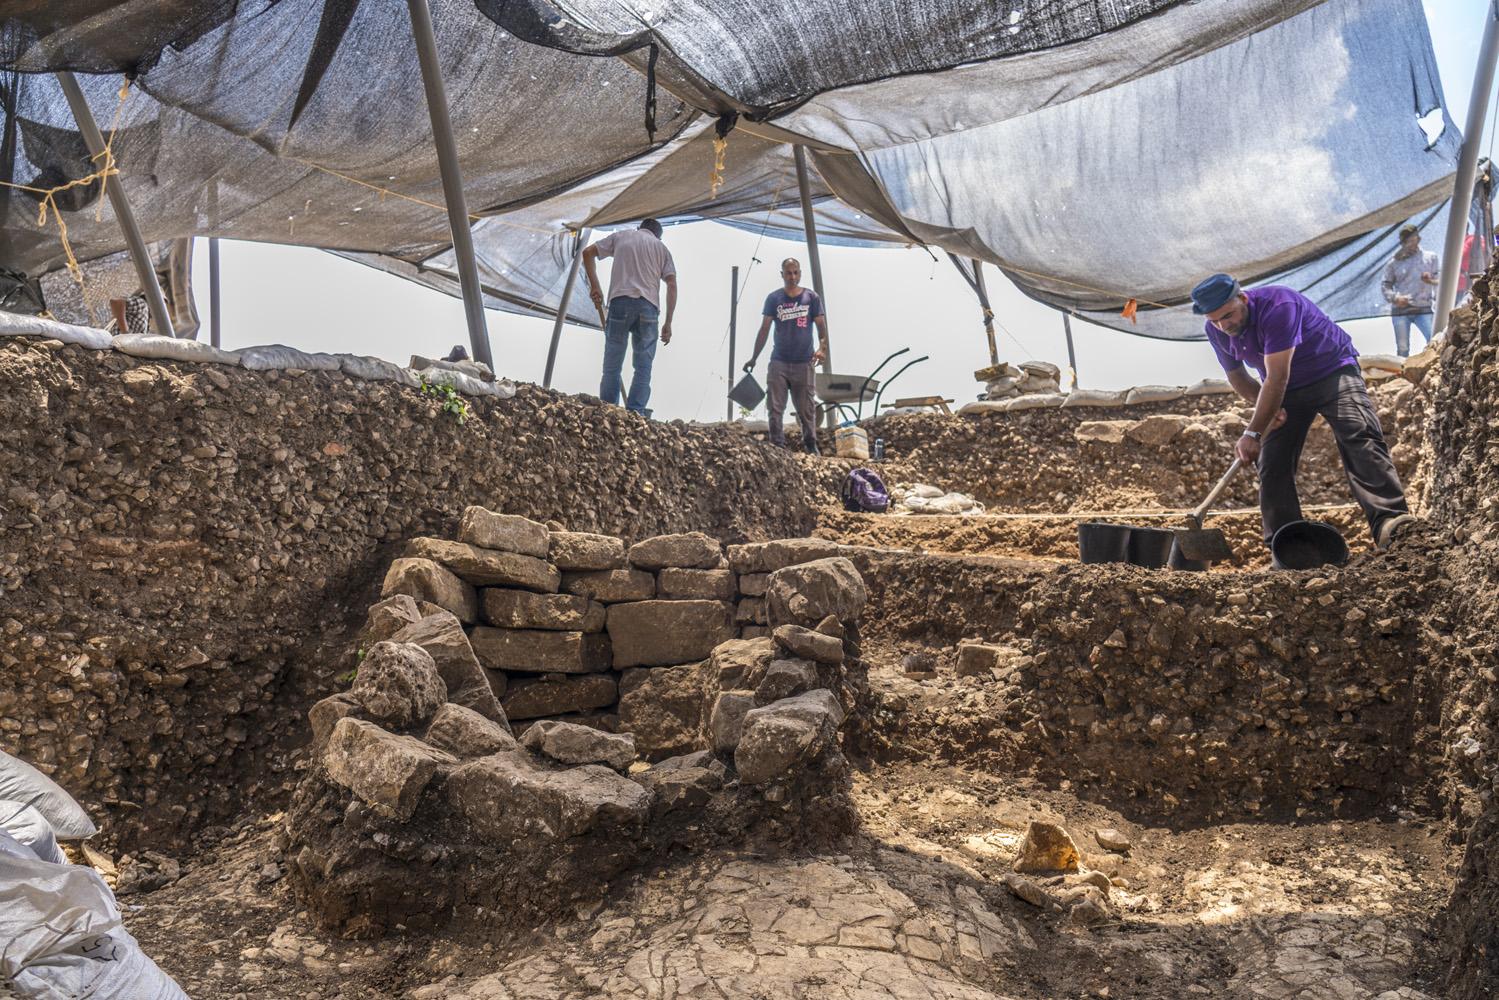 Excavation works on the site.  Photo: Yaniv Berman, Israel Antiquities Authority.